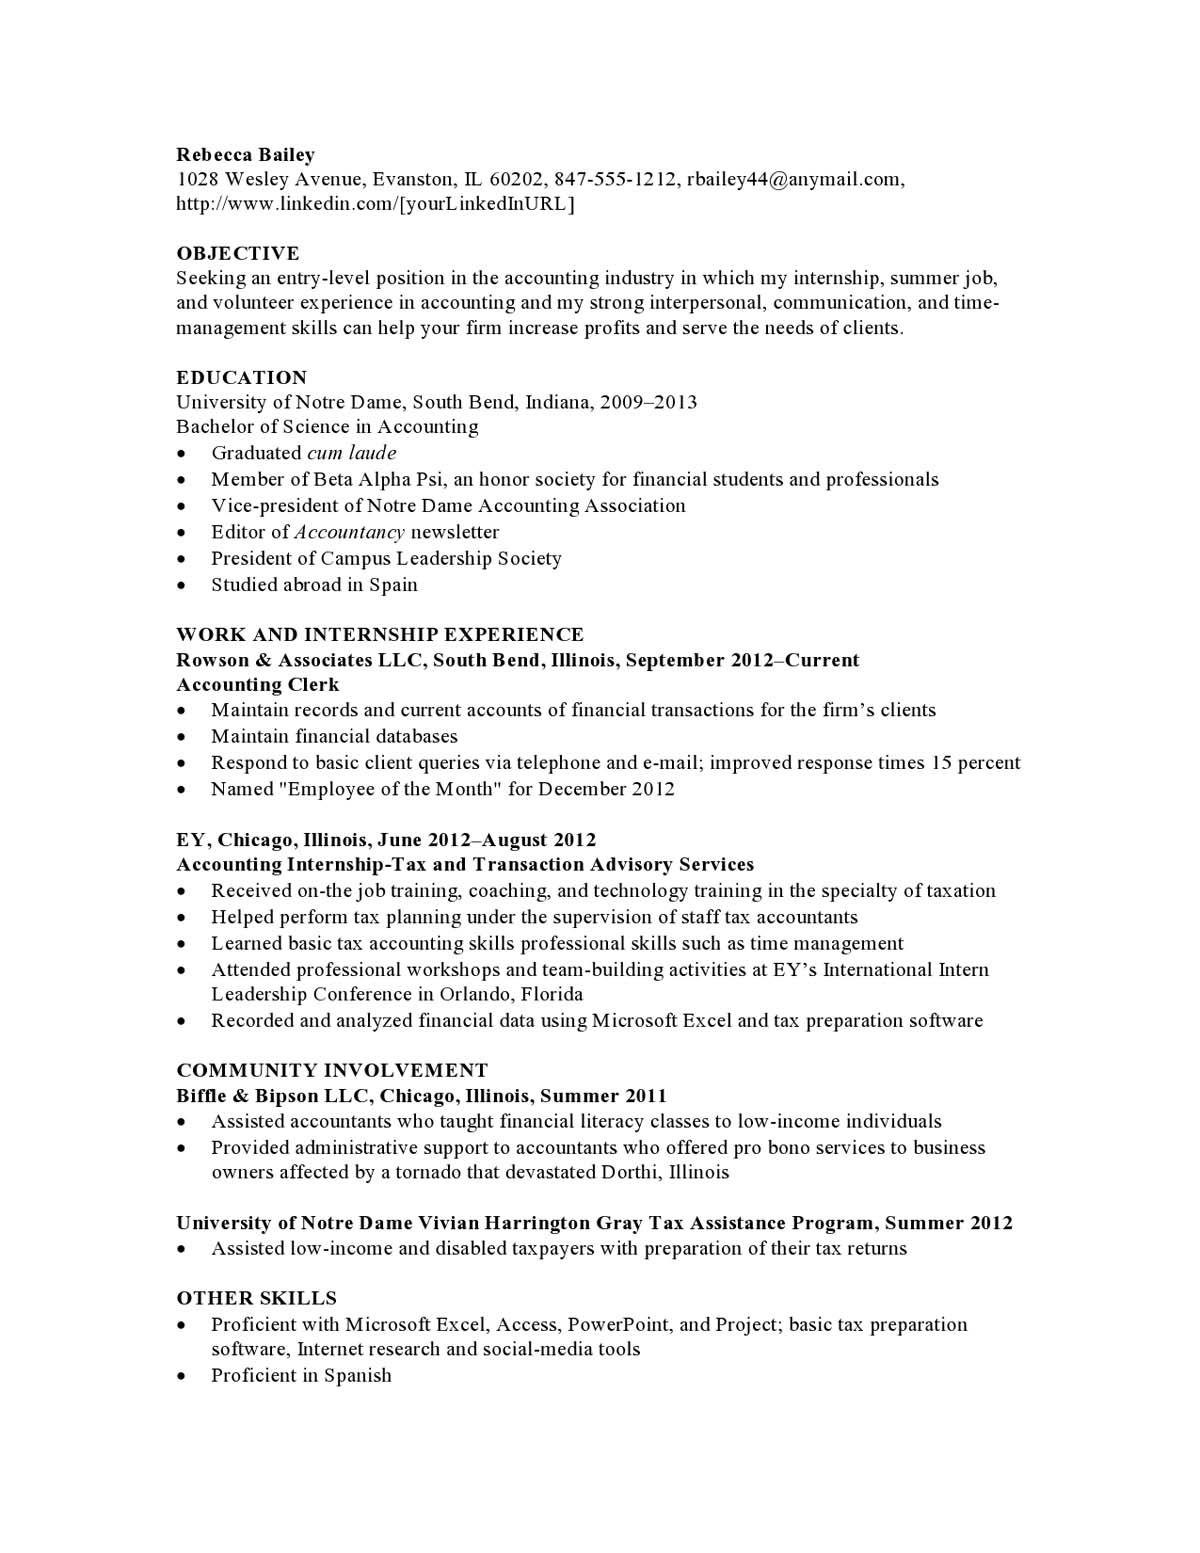 Resume Templates Social Work (3) TEMPLATES EXAMPLE